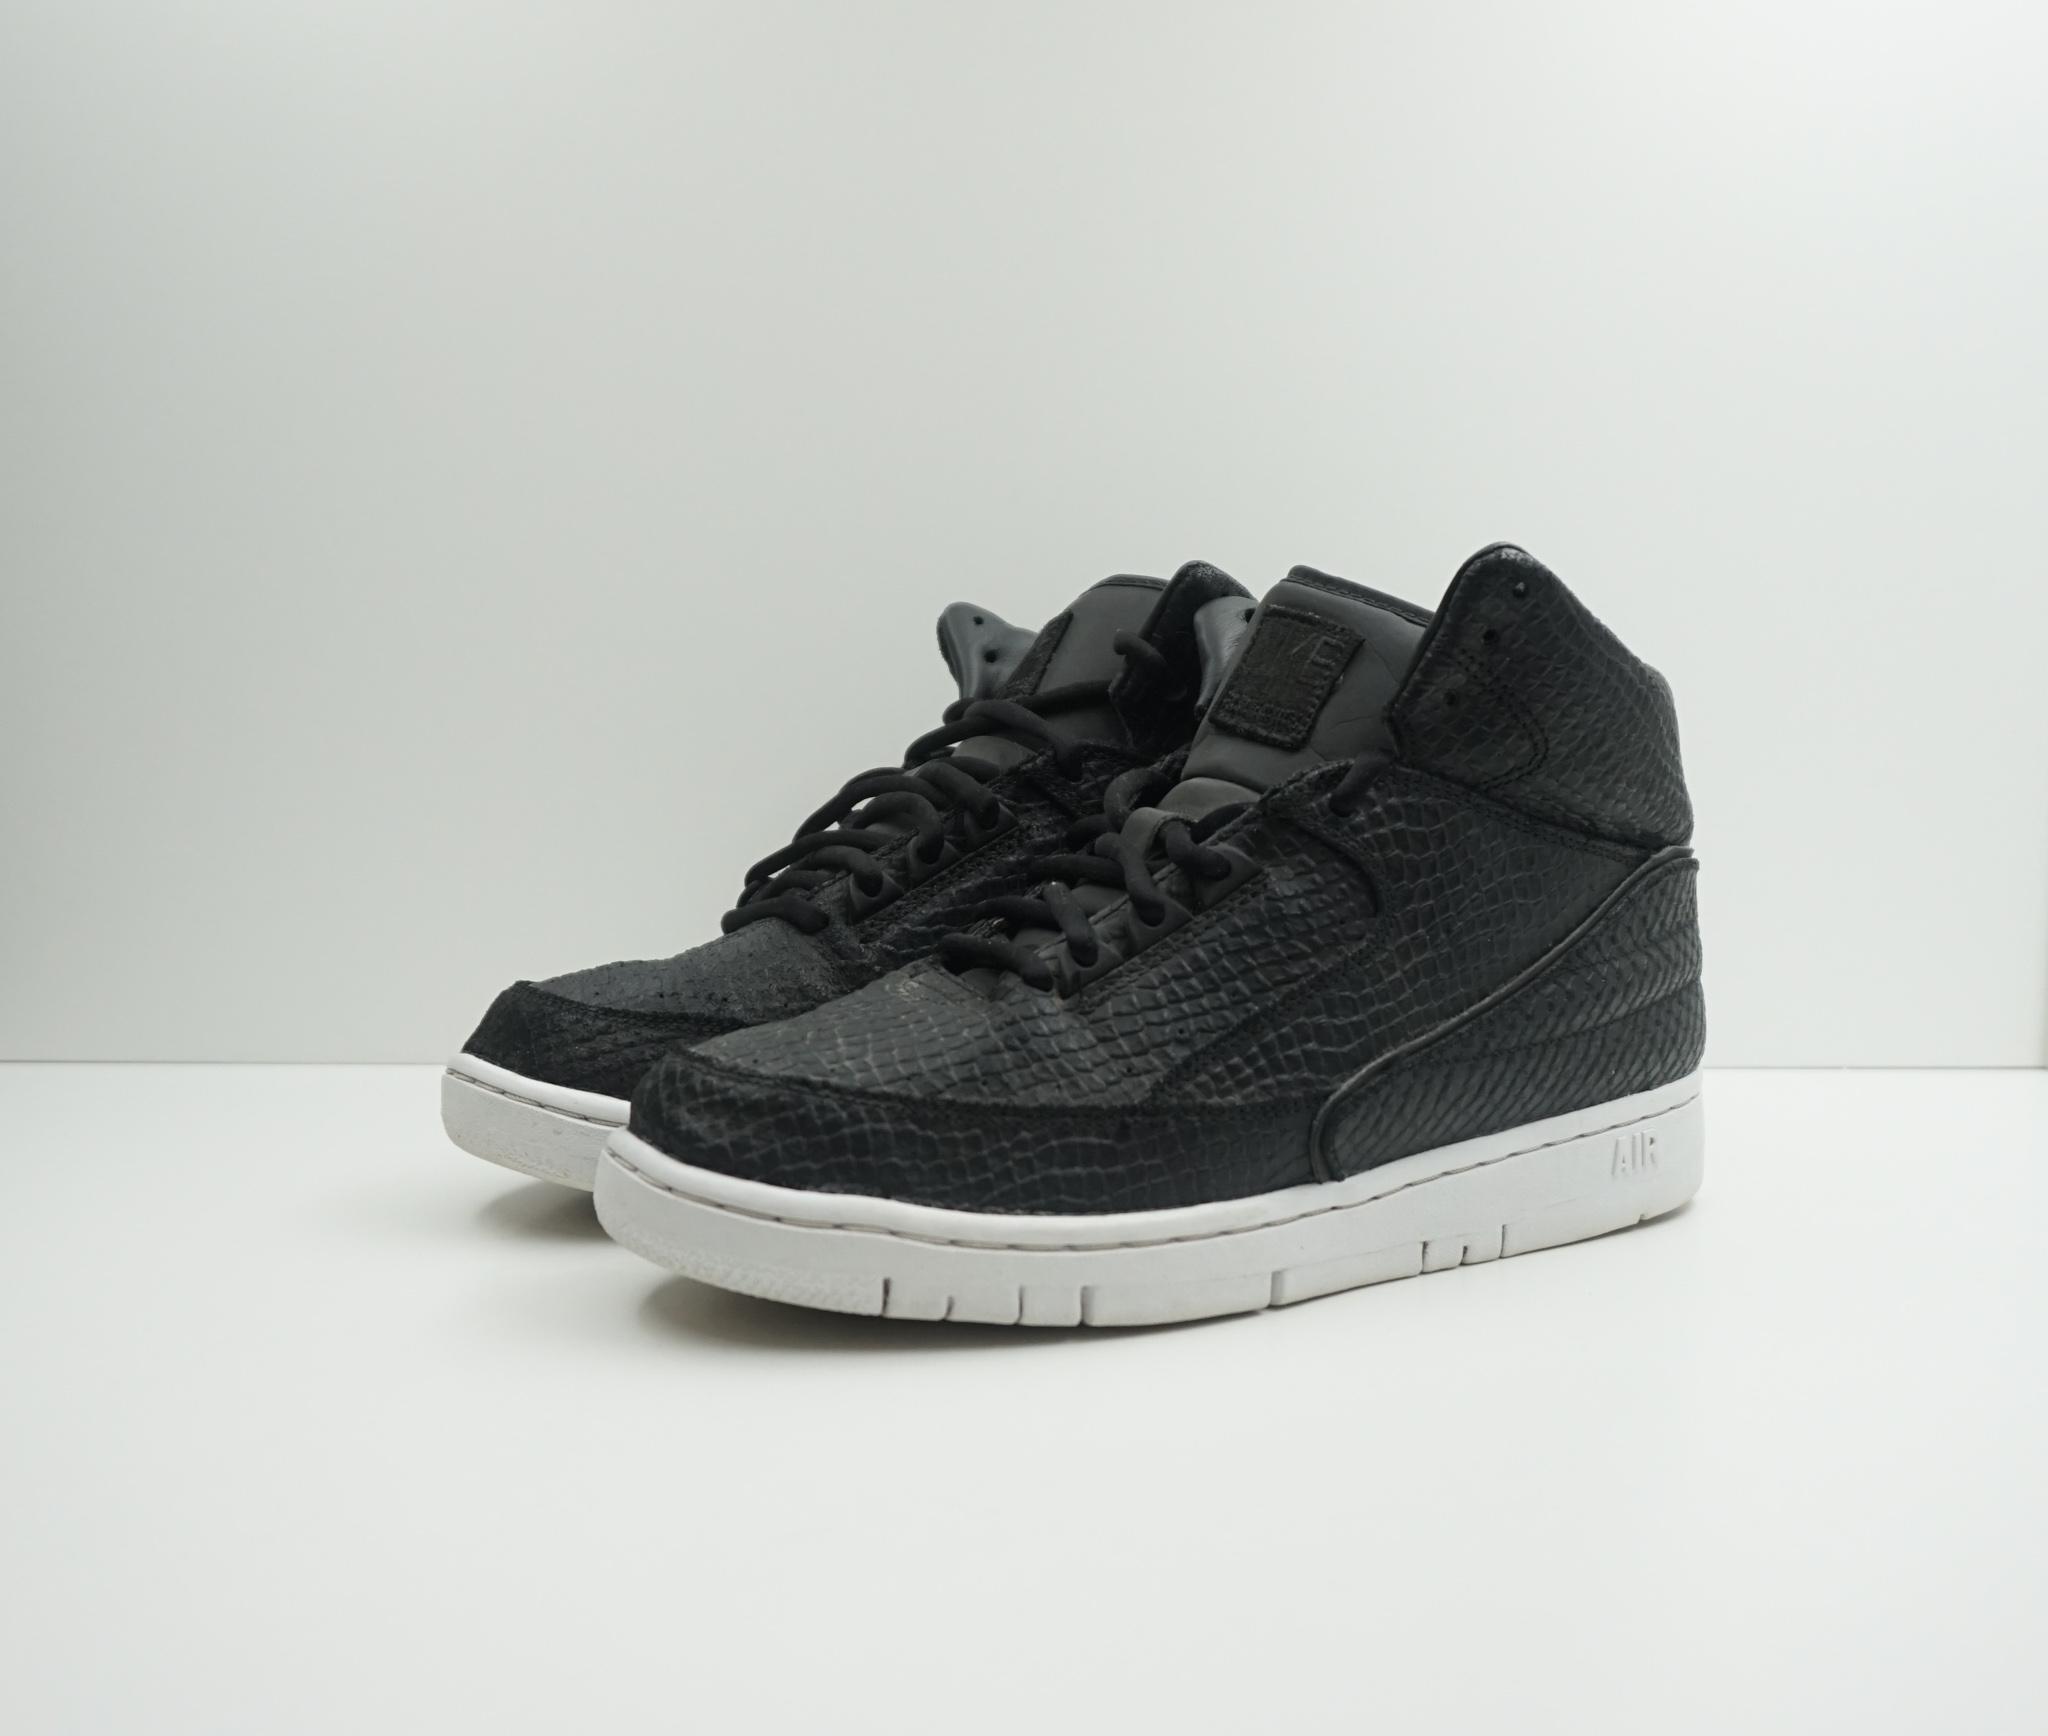 Nike Air Python DSM NYC SP